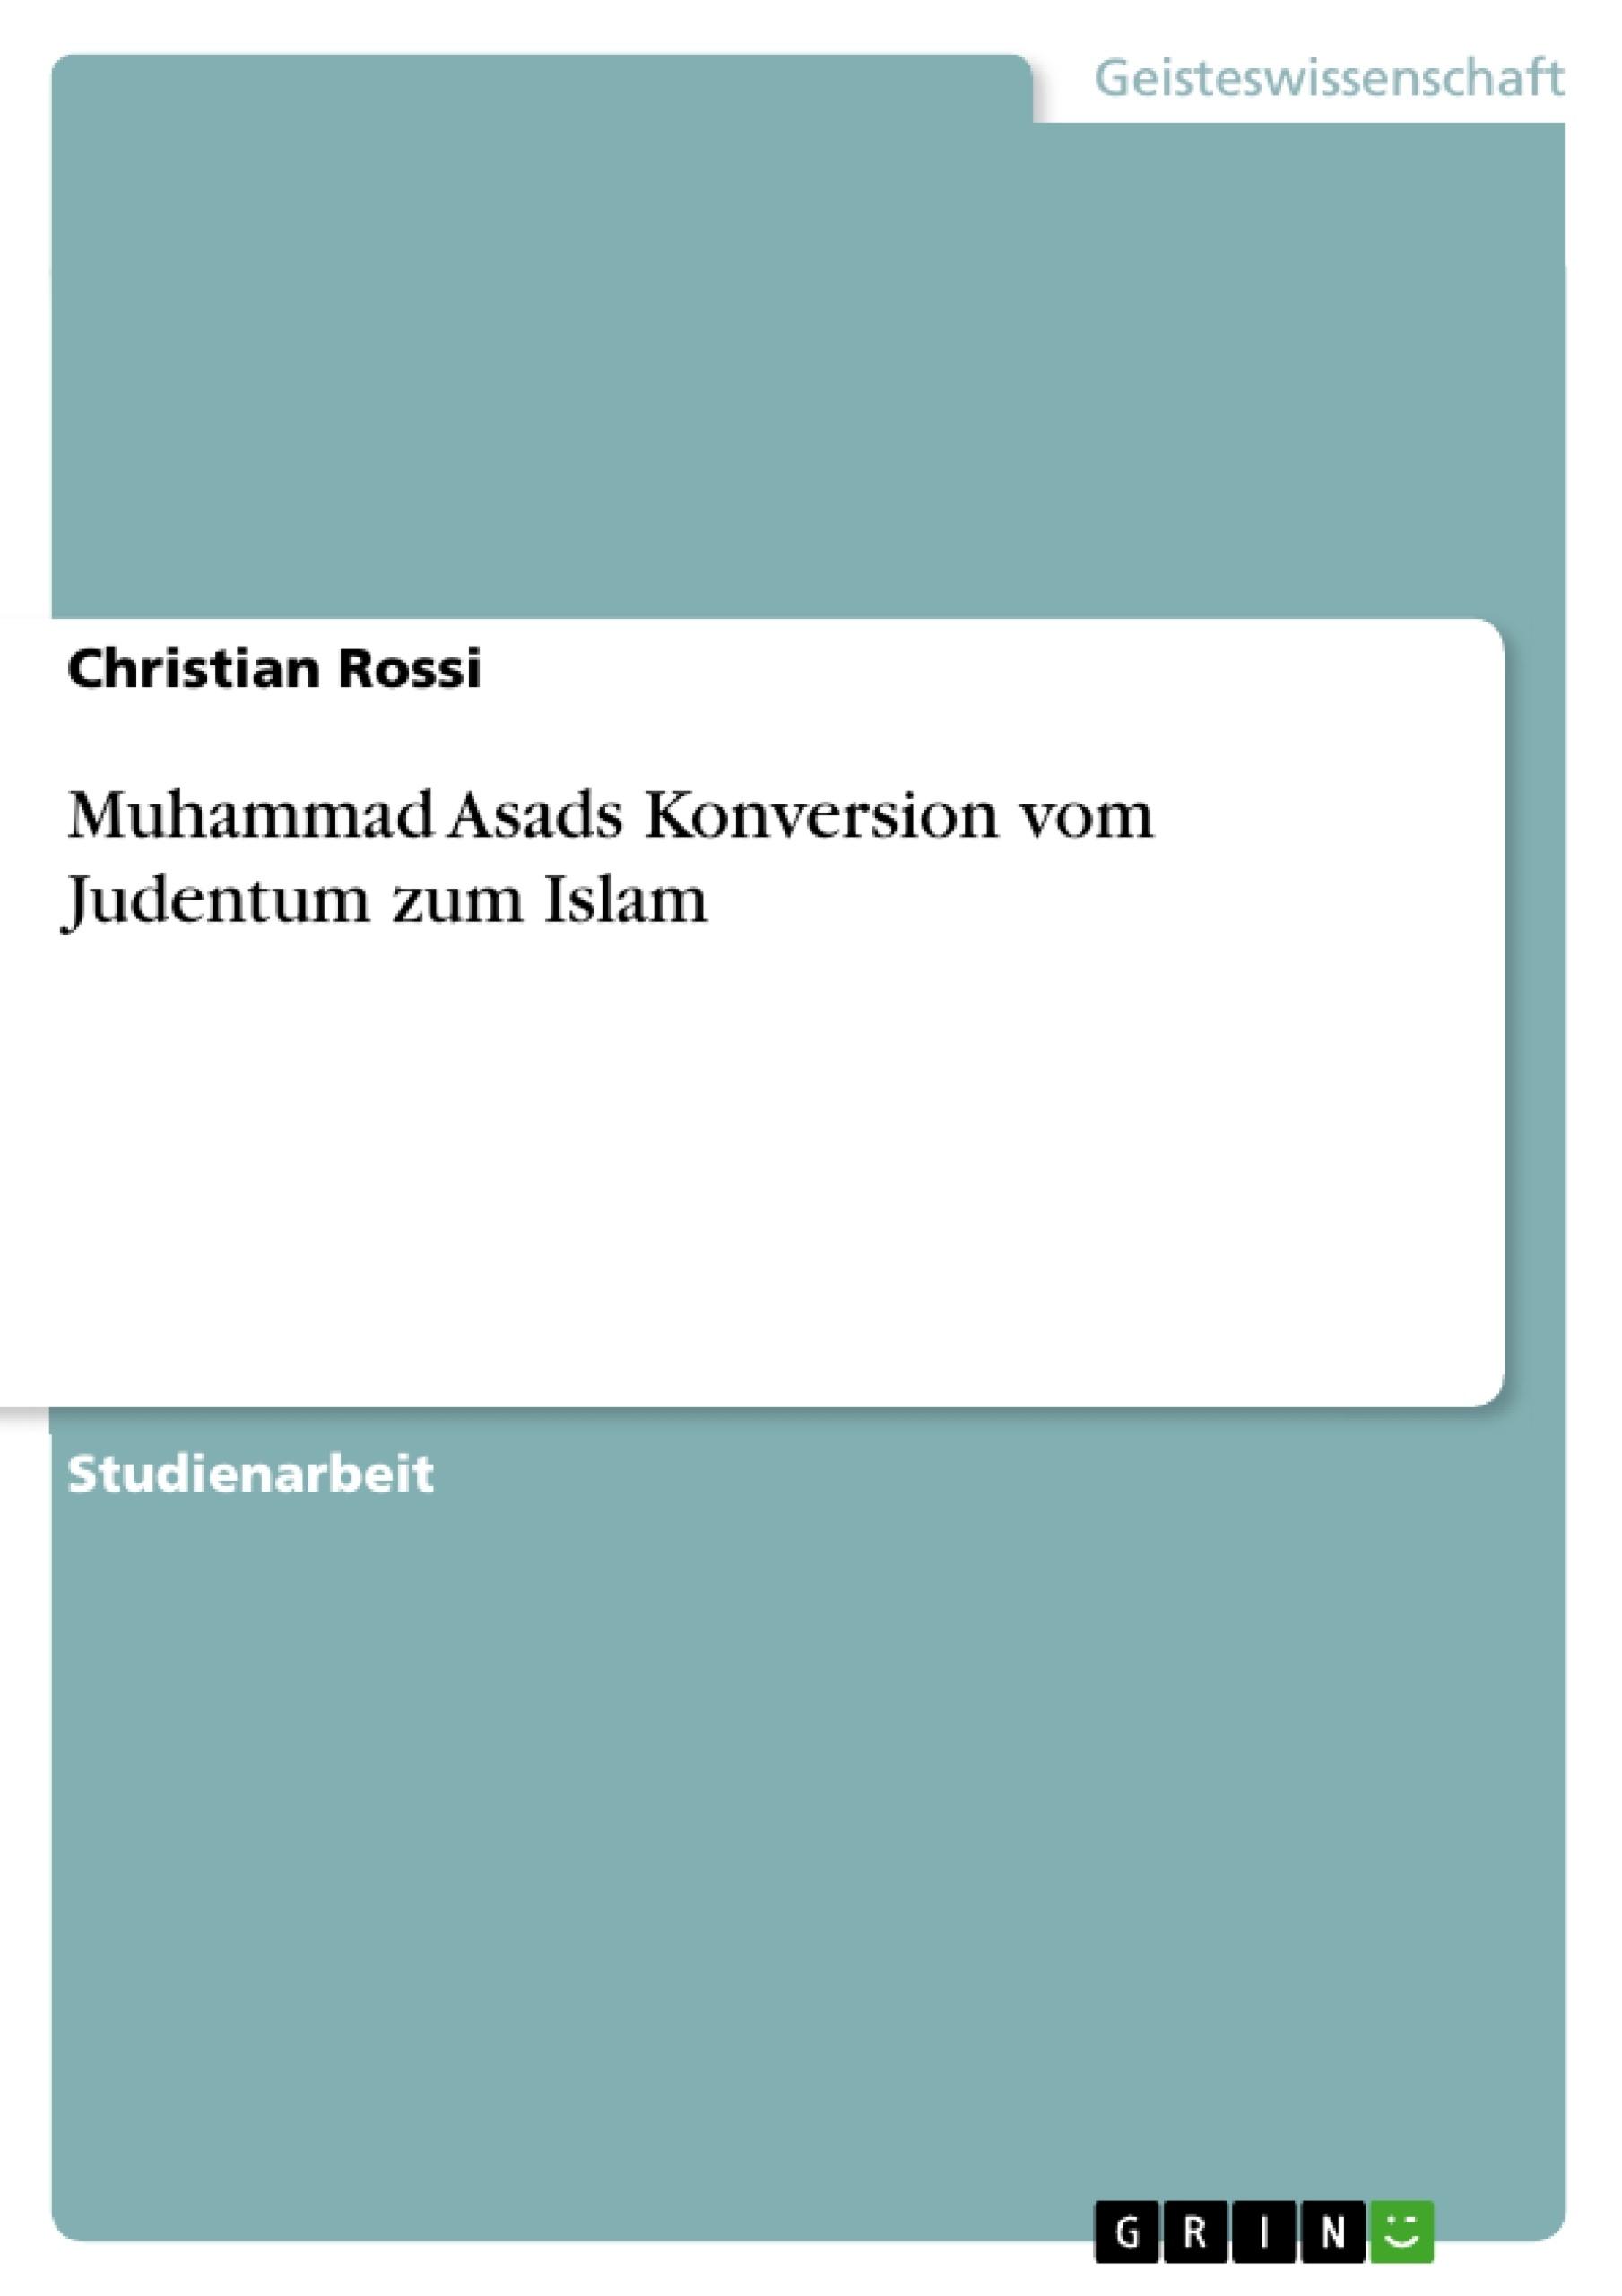 Titel: Muhammad Asads Konversion vom Judentum zum Islam